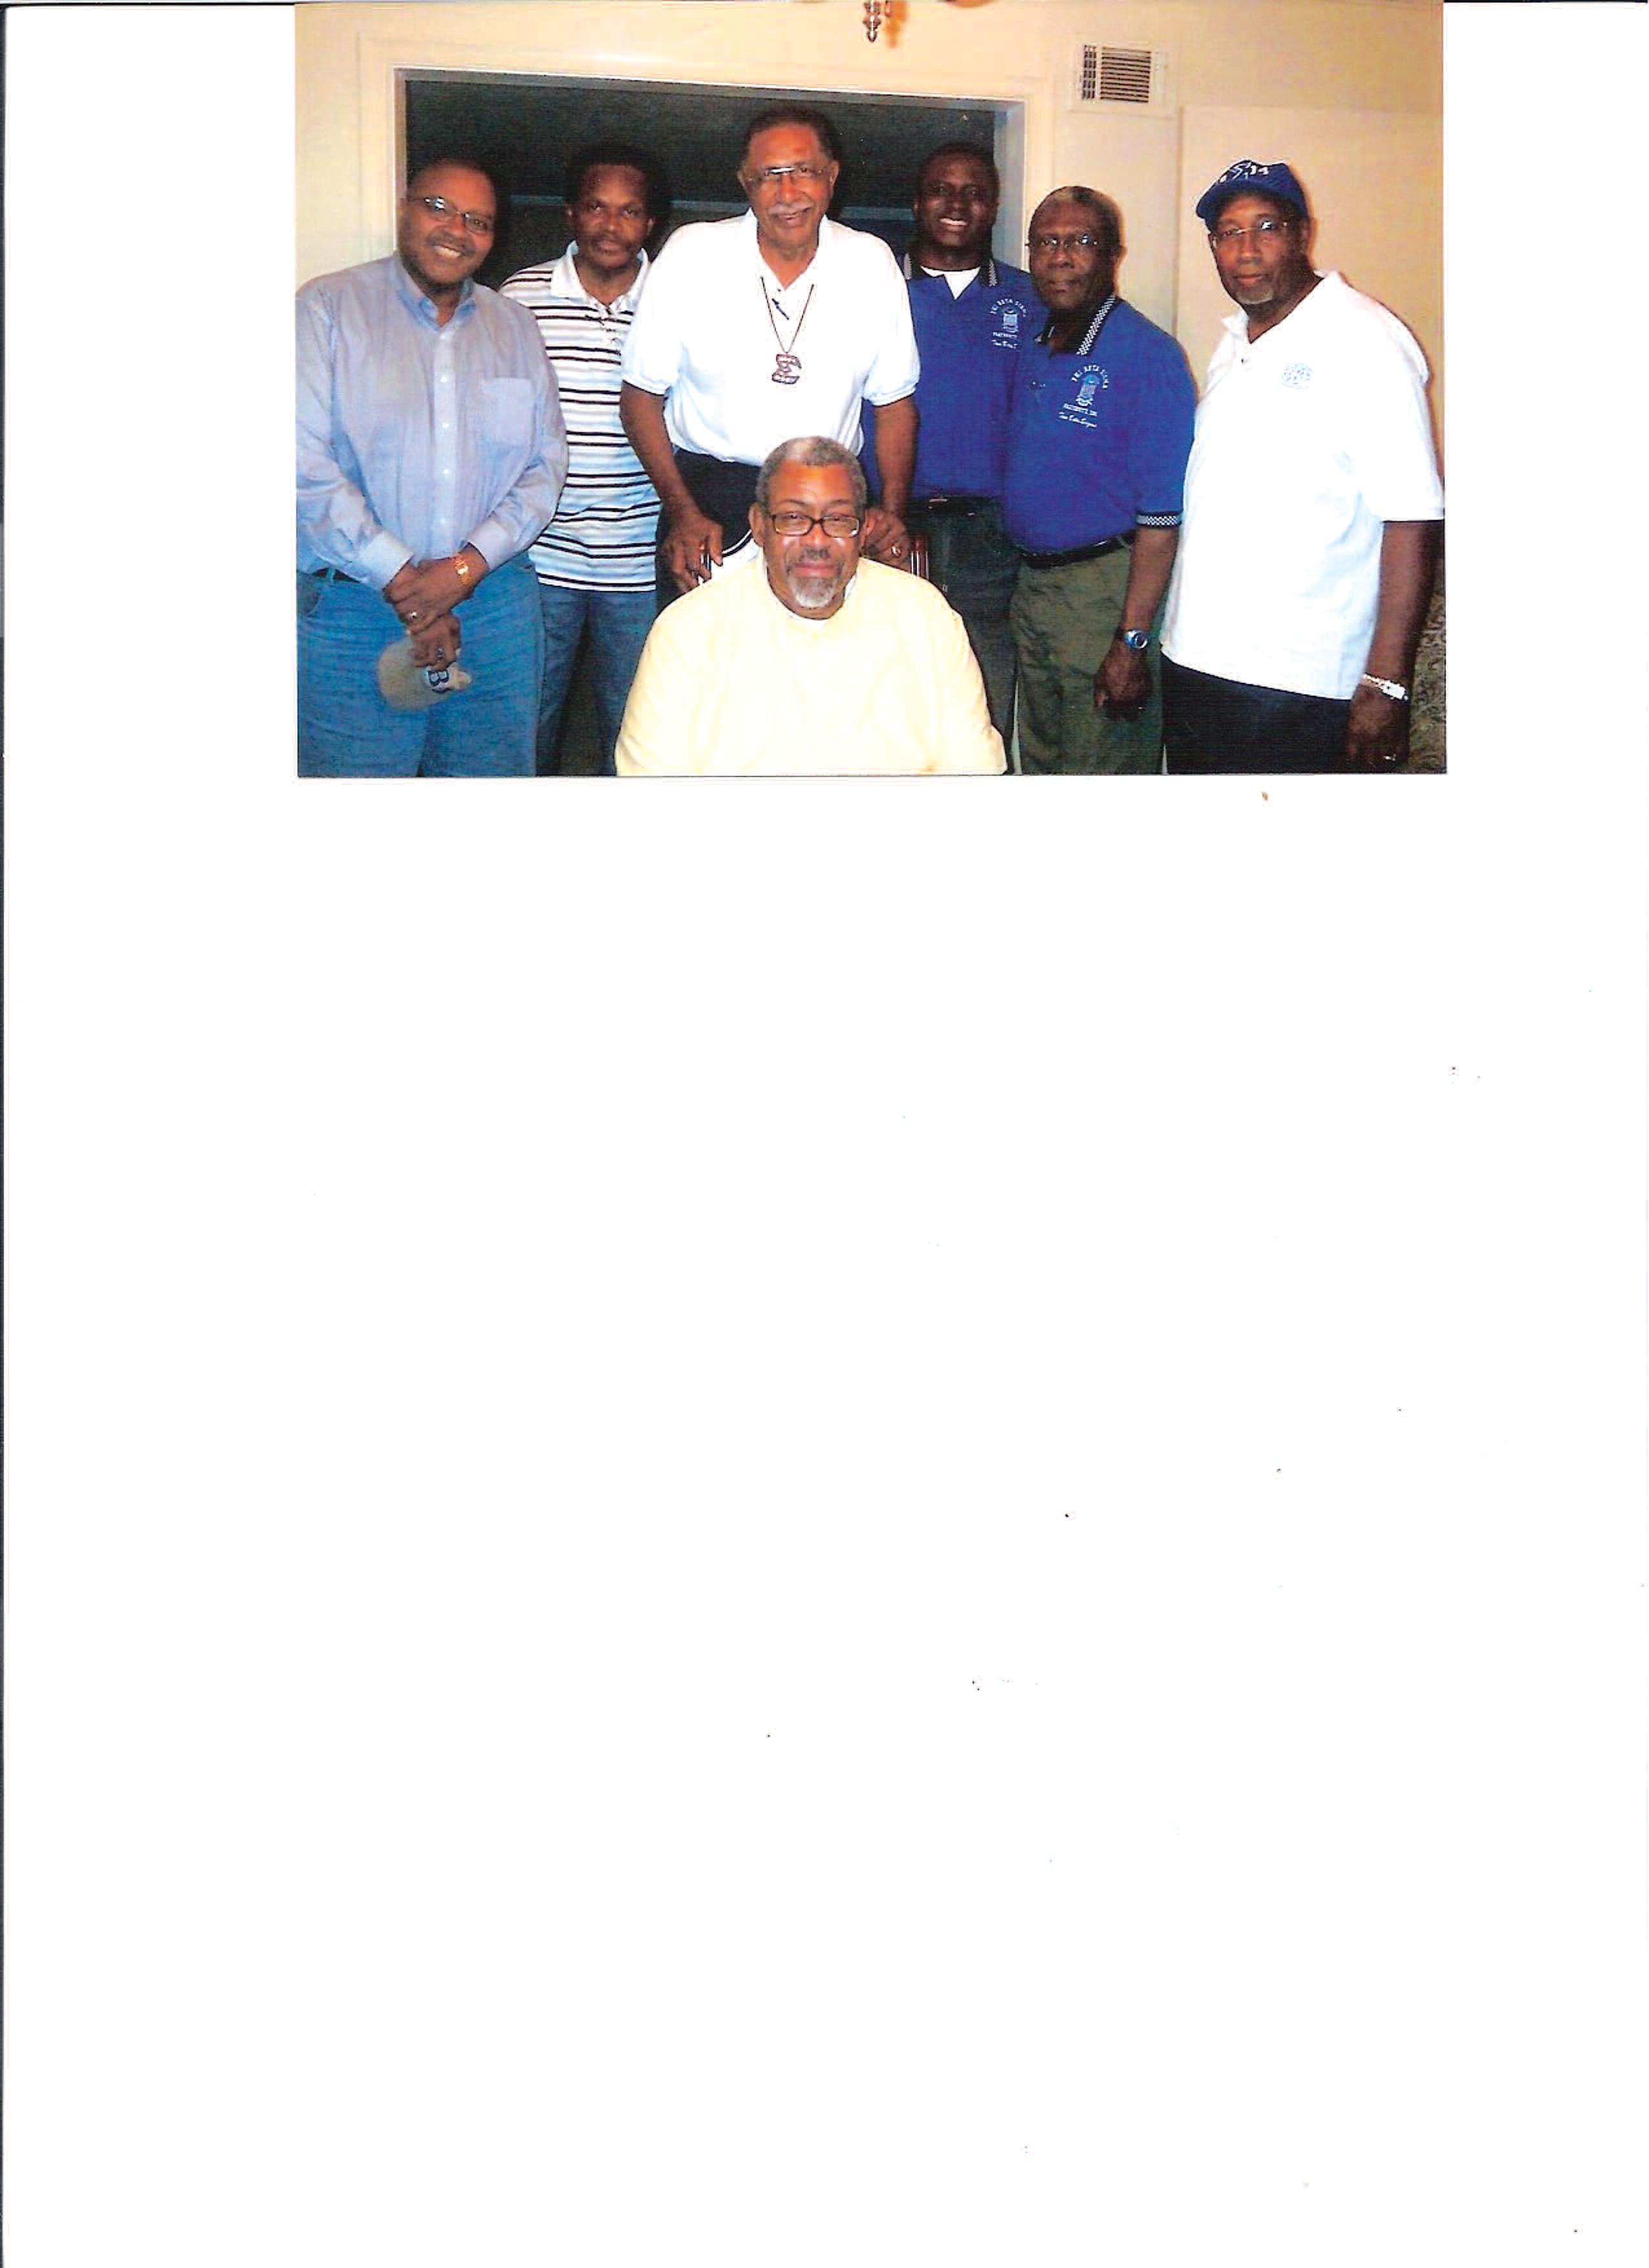 L to R: Bro. Rev. William Eason, Bro. Edward Oglesby, Bro. Enoch Mathis, Bro. Brian Dawsey, Bro. Rev. Charles Purnell, Bro. Carl Moffit, and the Birthday Boy, Dr. Jeffrey James.